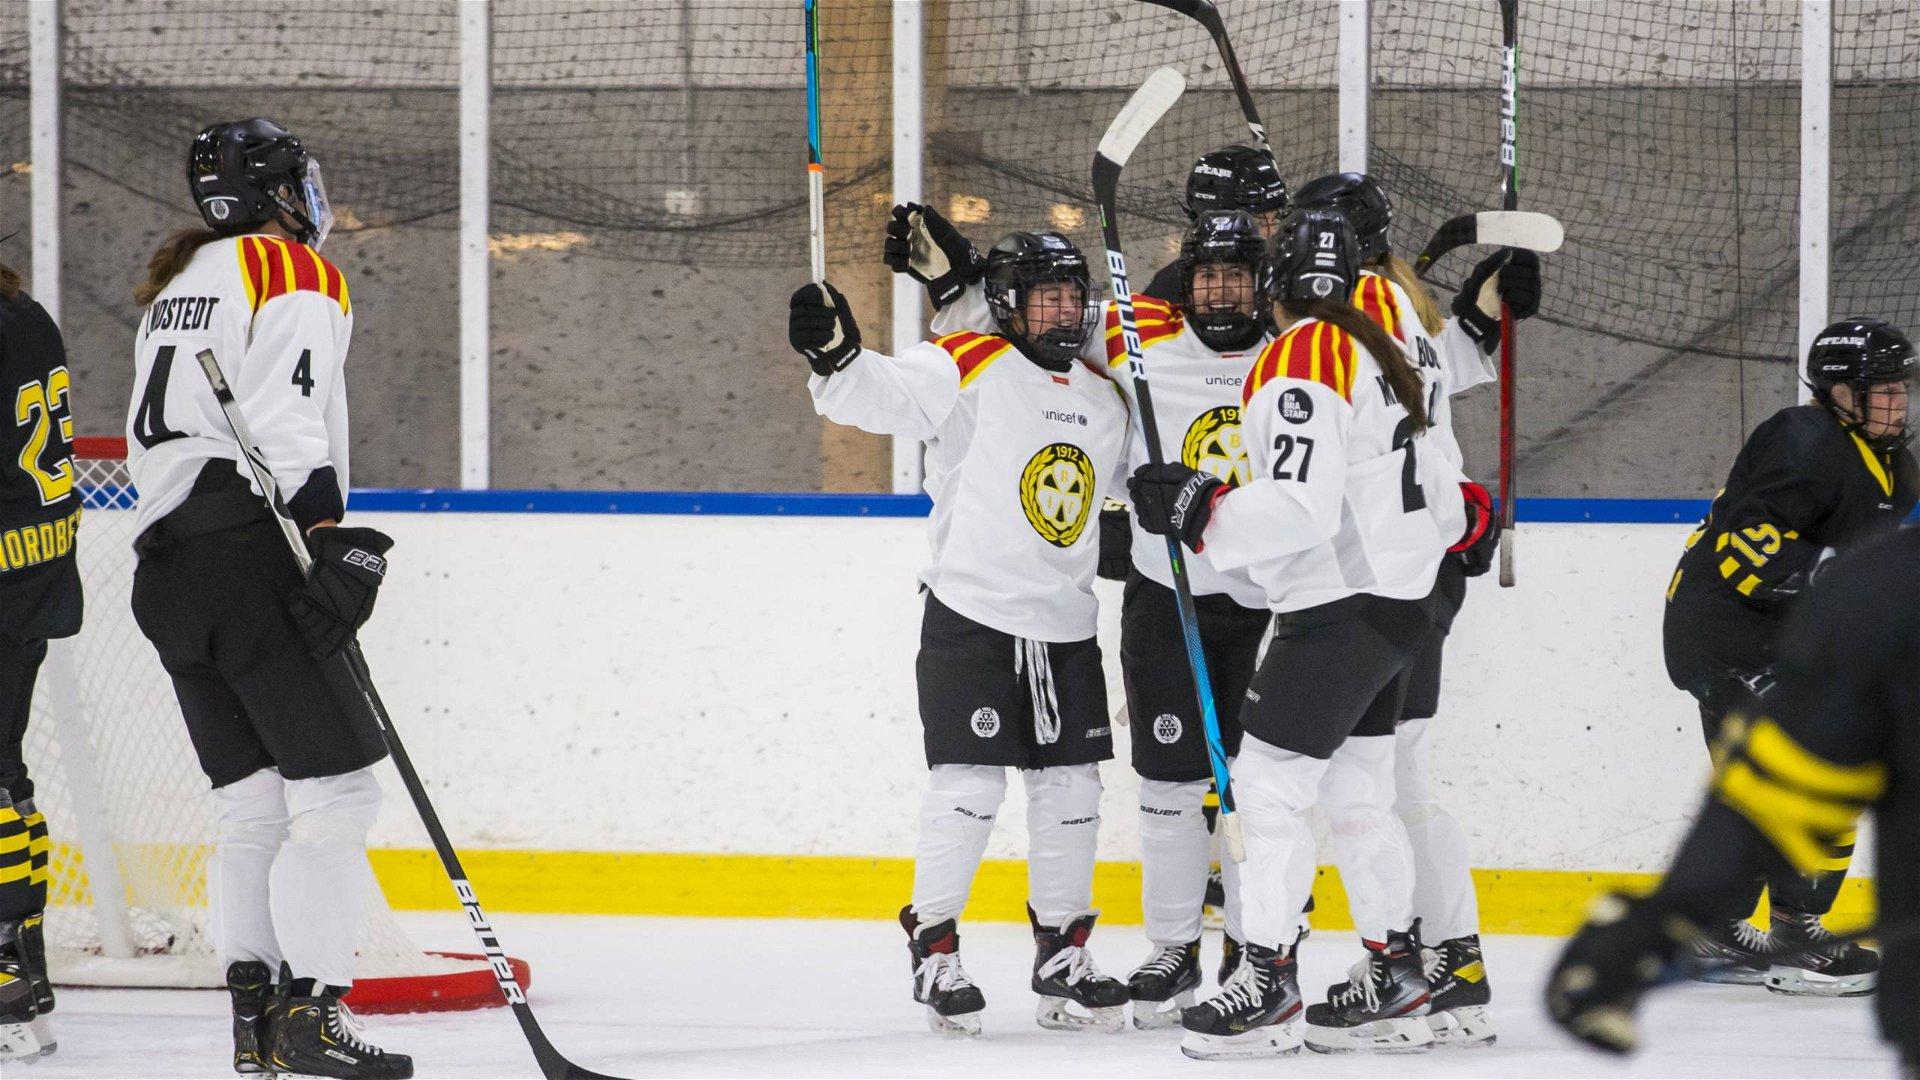 Highlights: AIK-Brynäs 18 sept